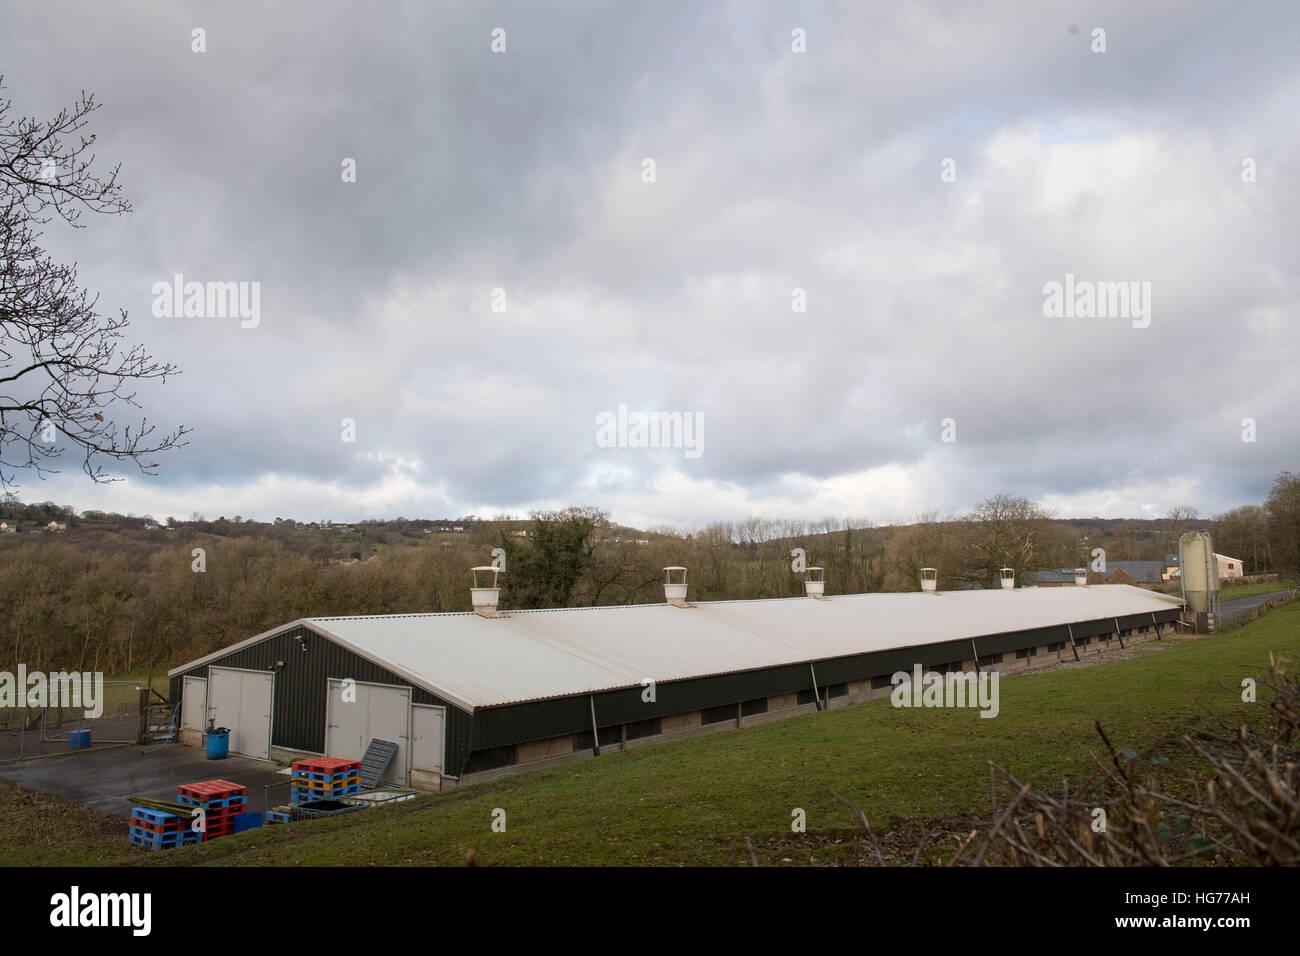 Hirwaun Isaf Farm poultry chicken turkey farm in Pontyberem, Carmarthen, South Wales, UK - Stock Image